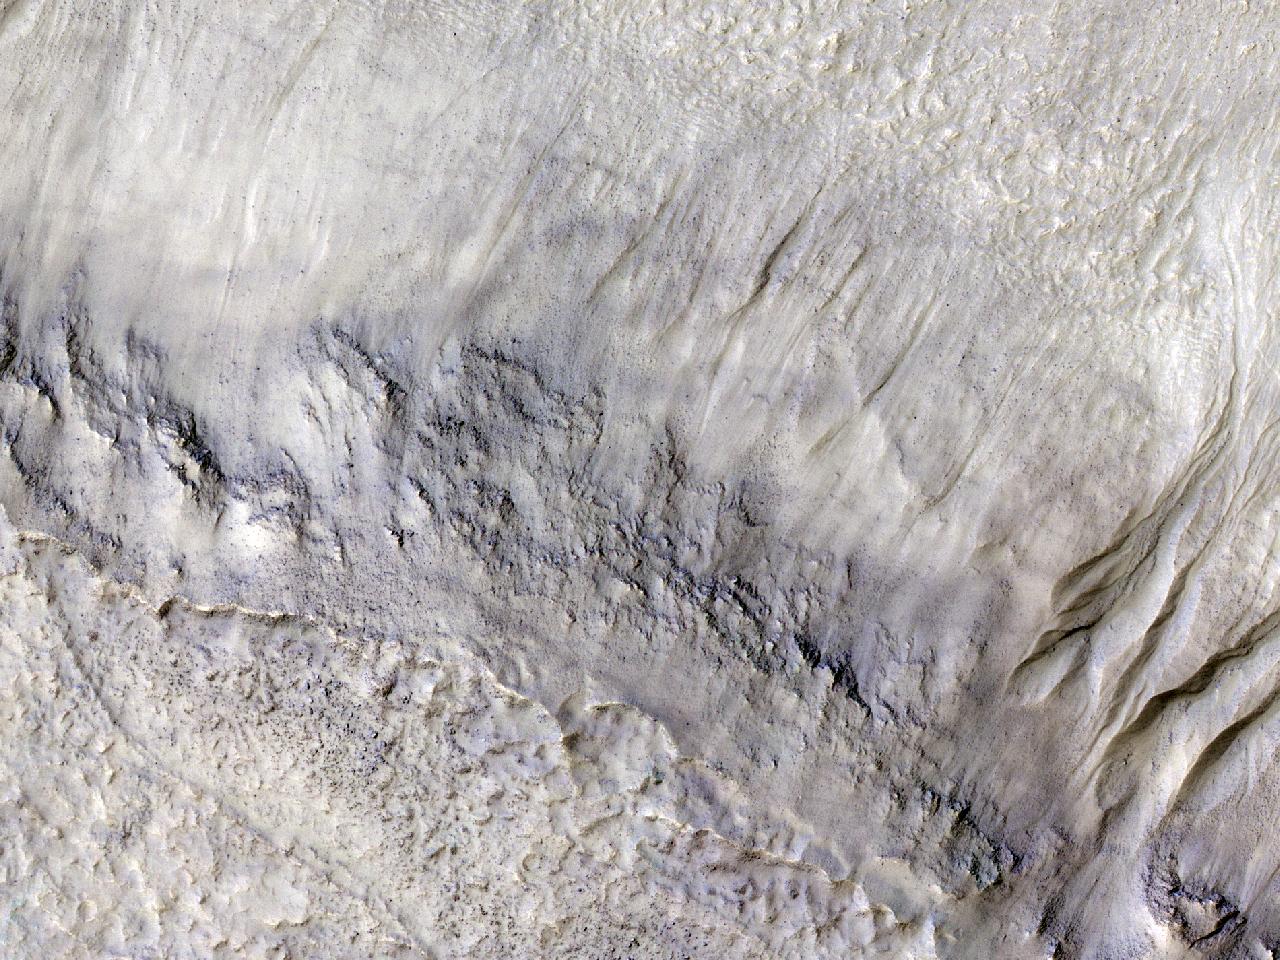 Rigole șipodeaua unui vechi crater de impact